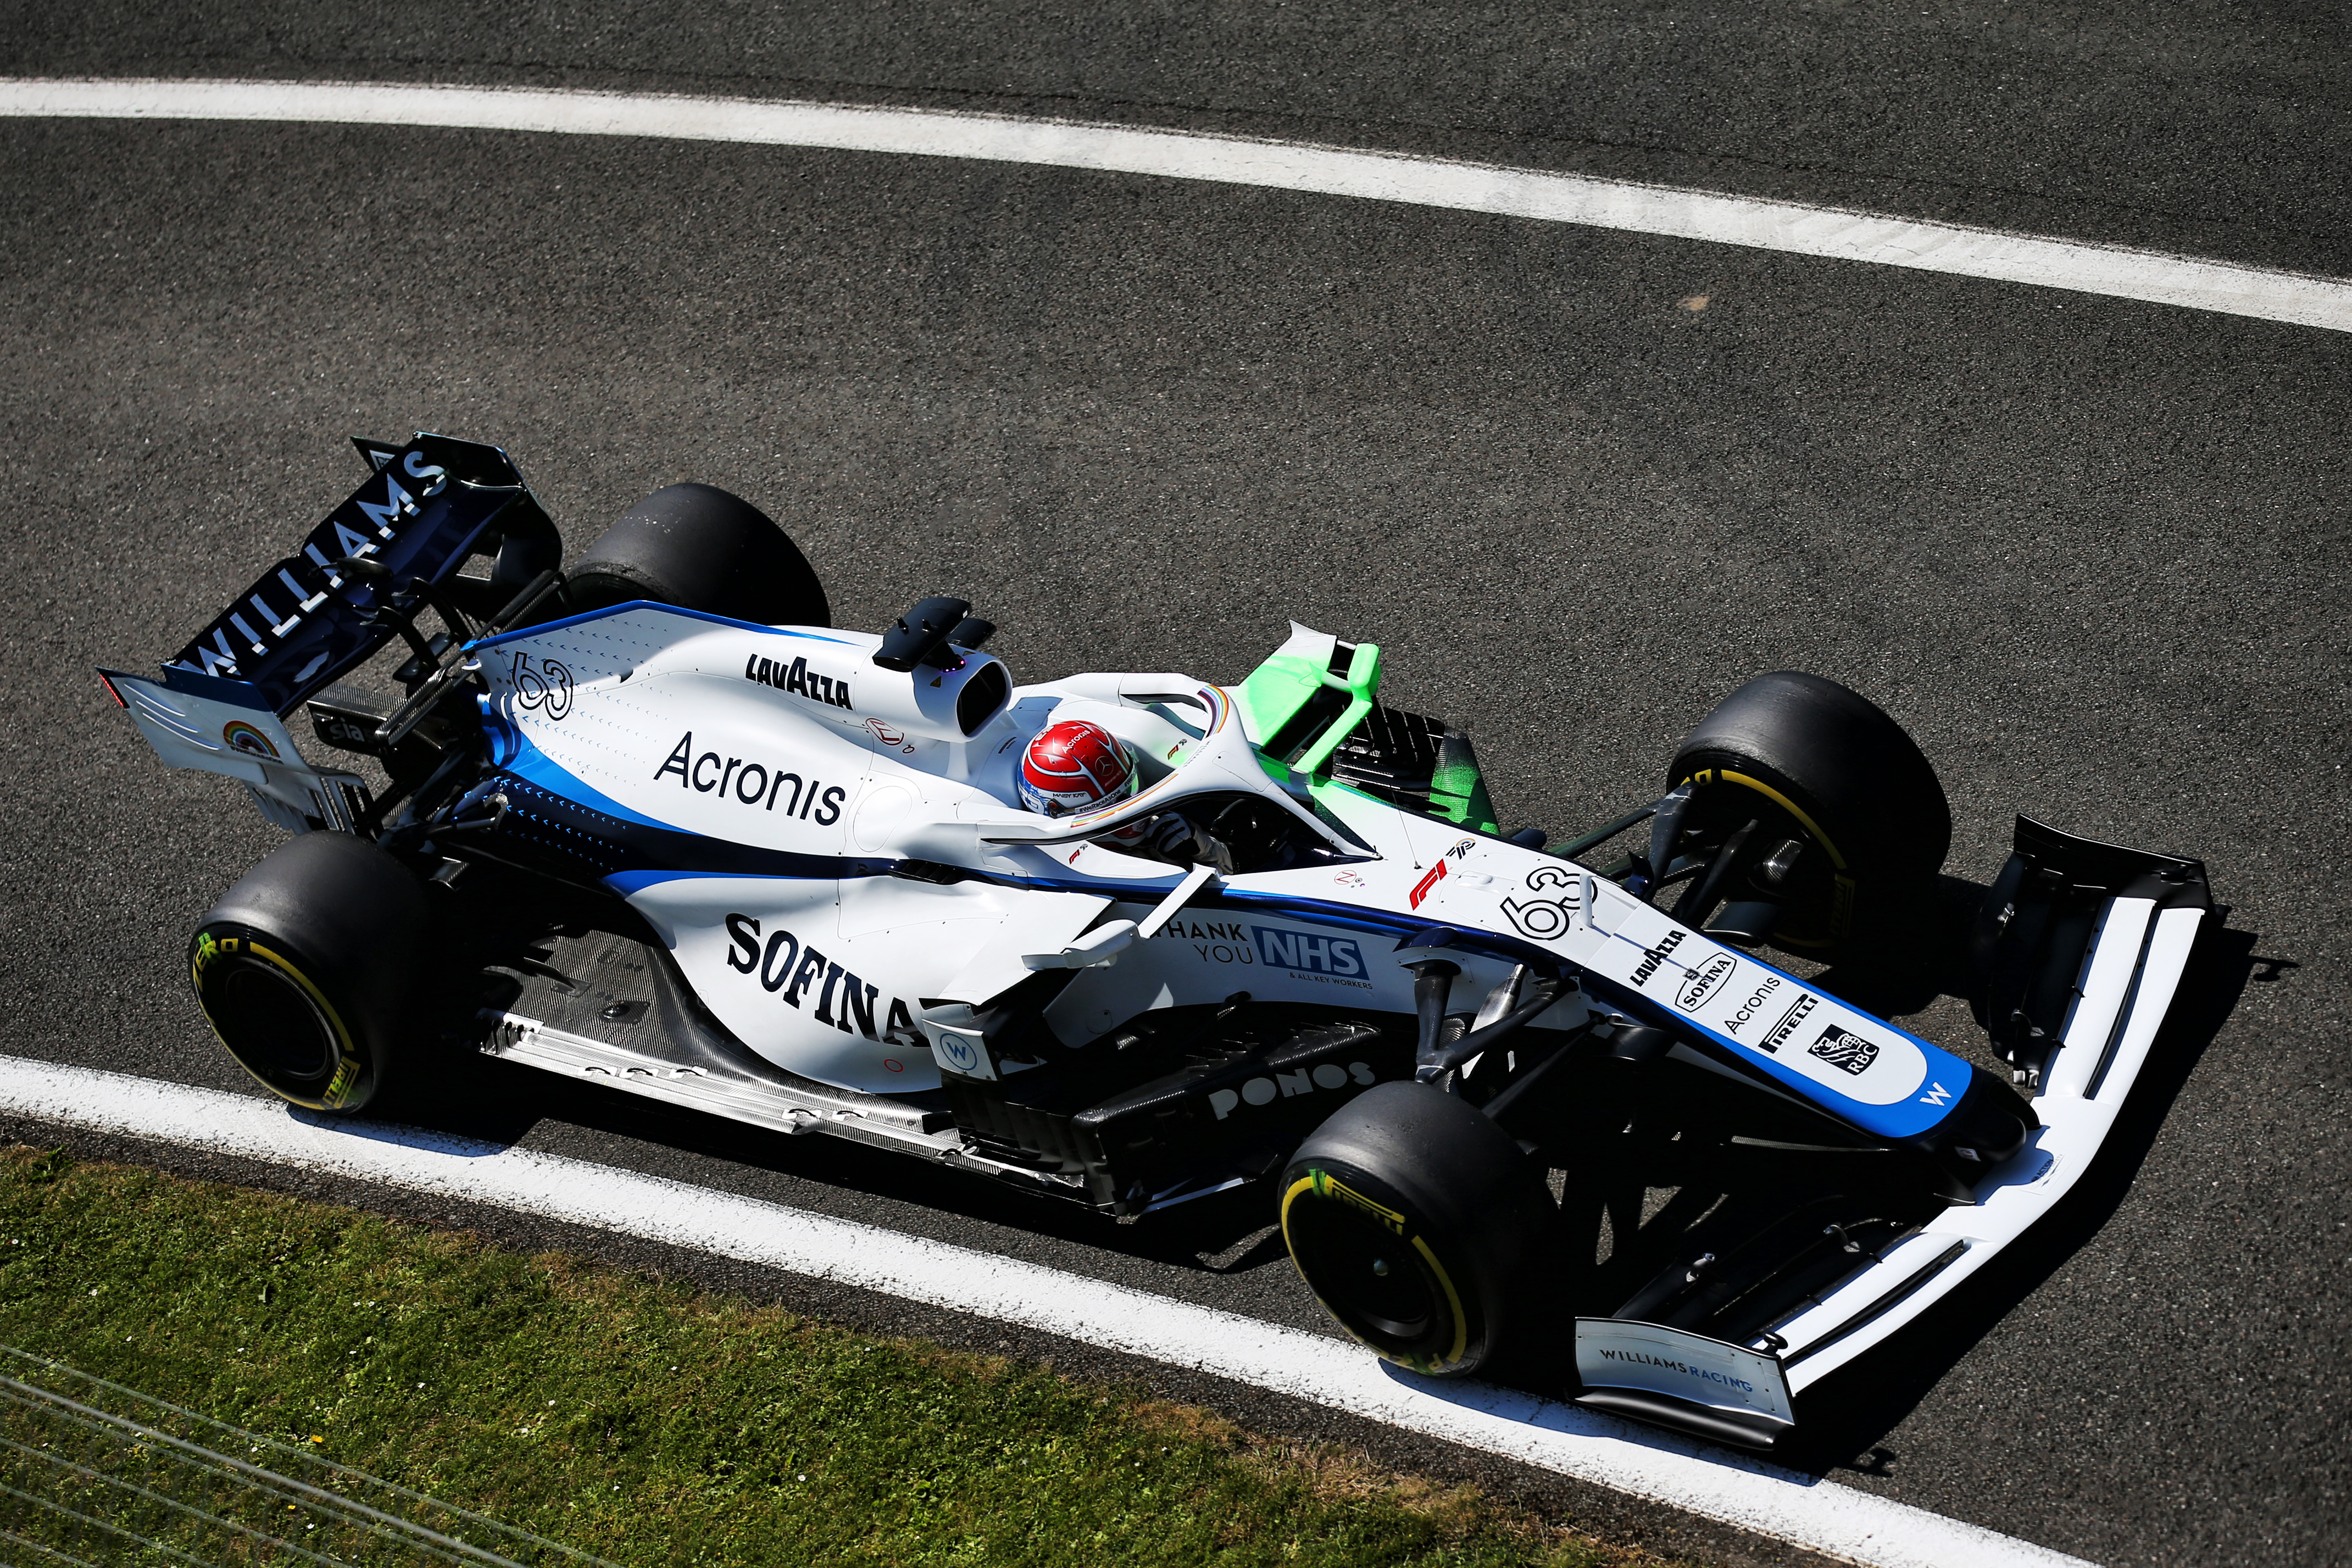 Motor Racing Formula One World Championship British Grand Prix Practice Day Silverstone, England